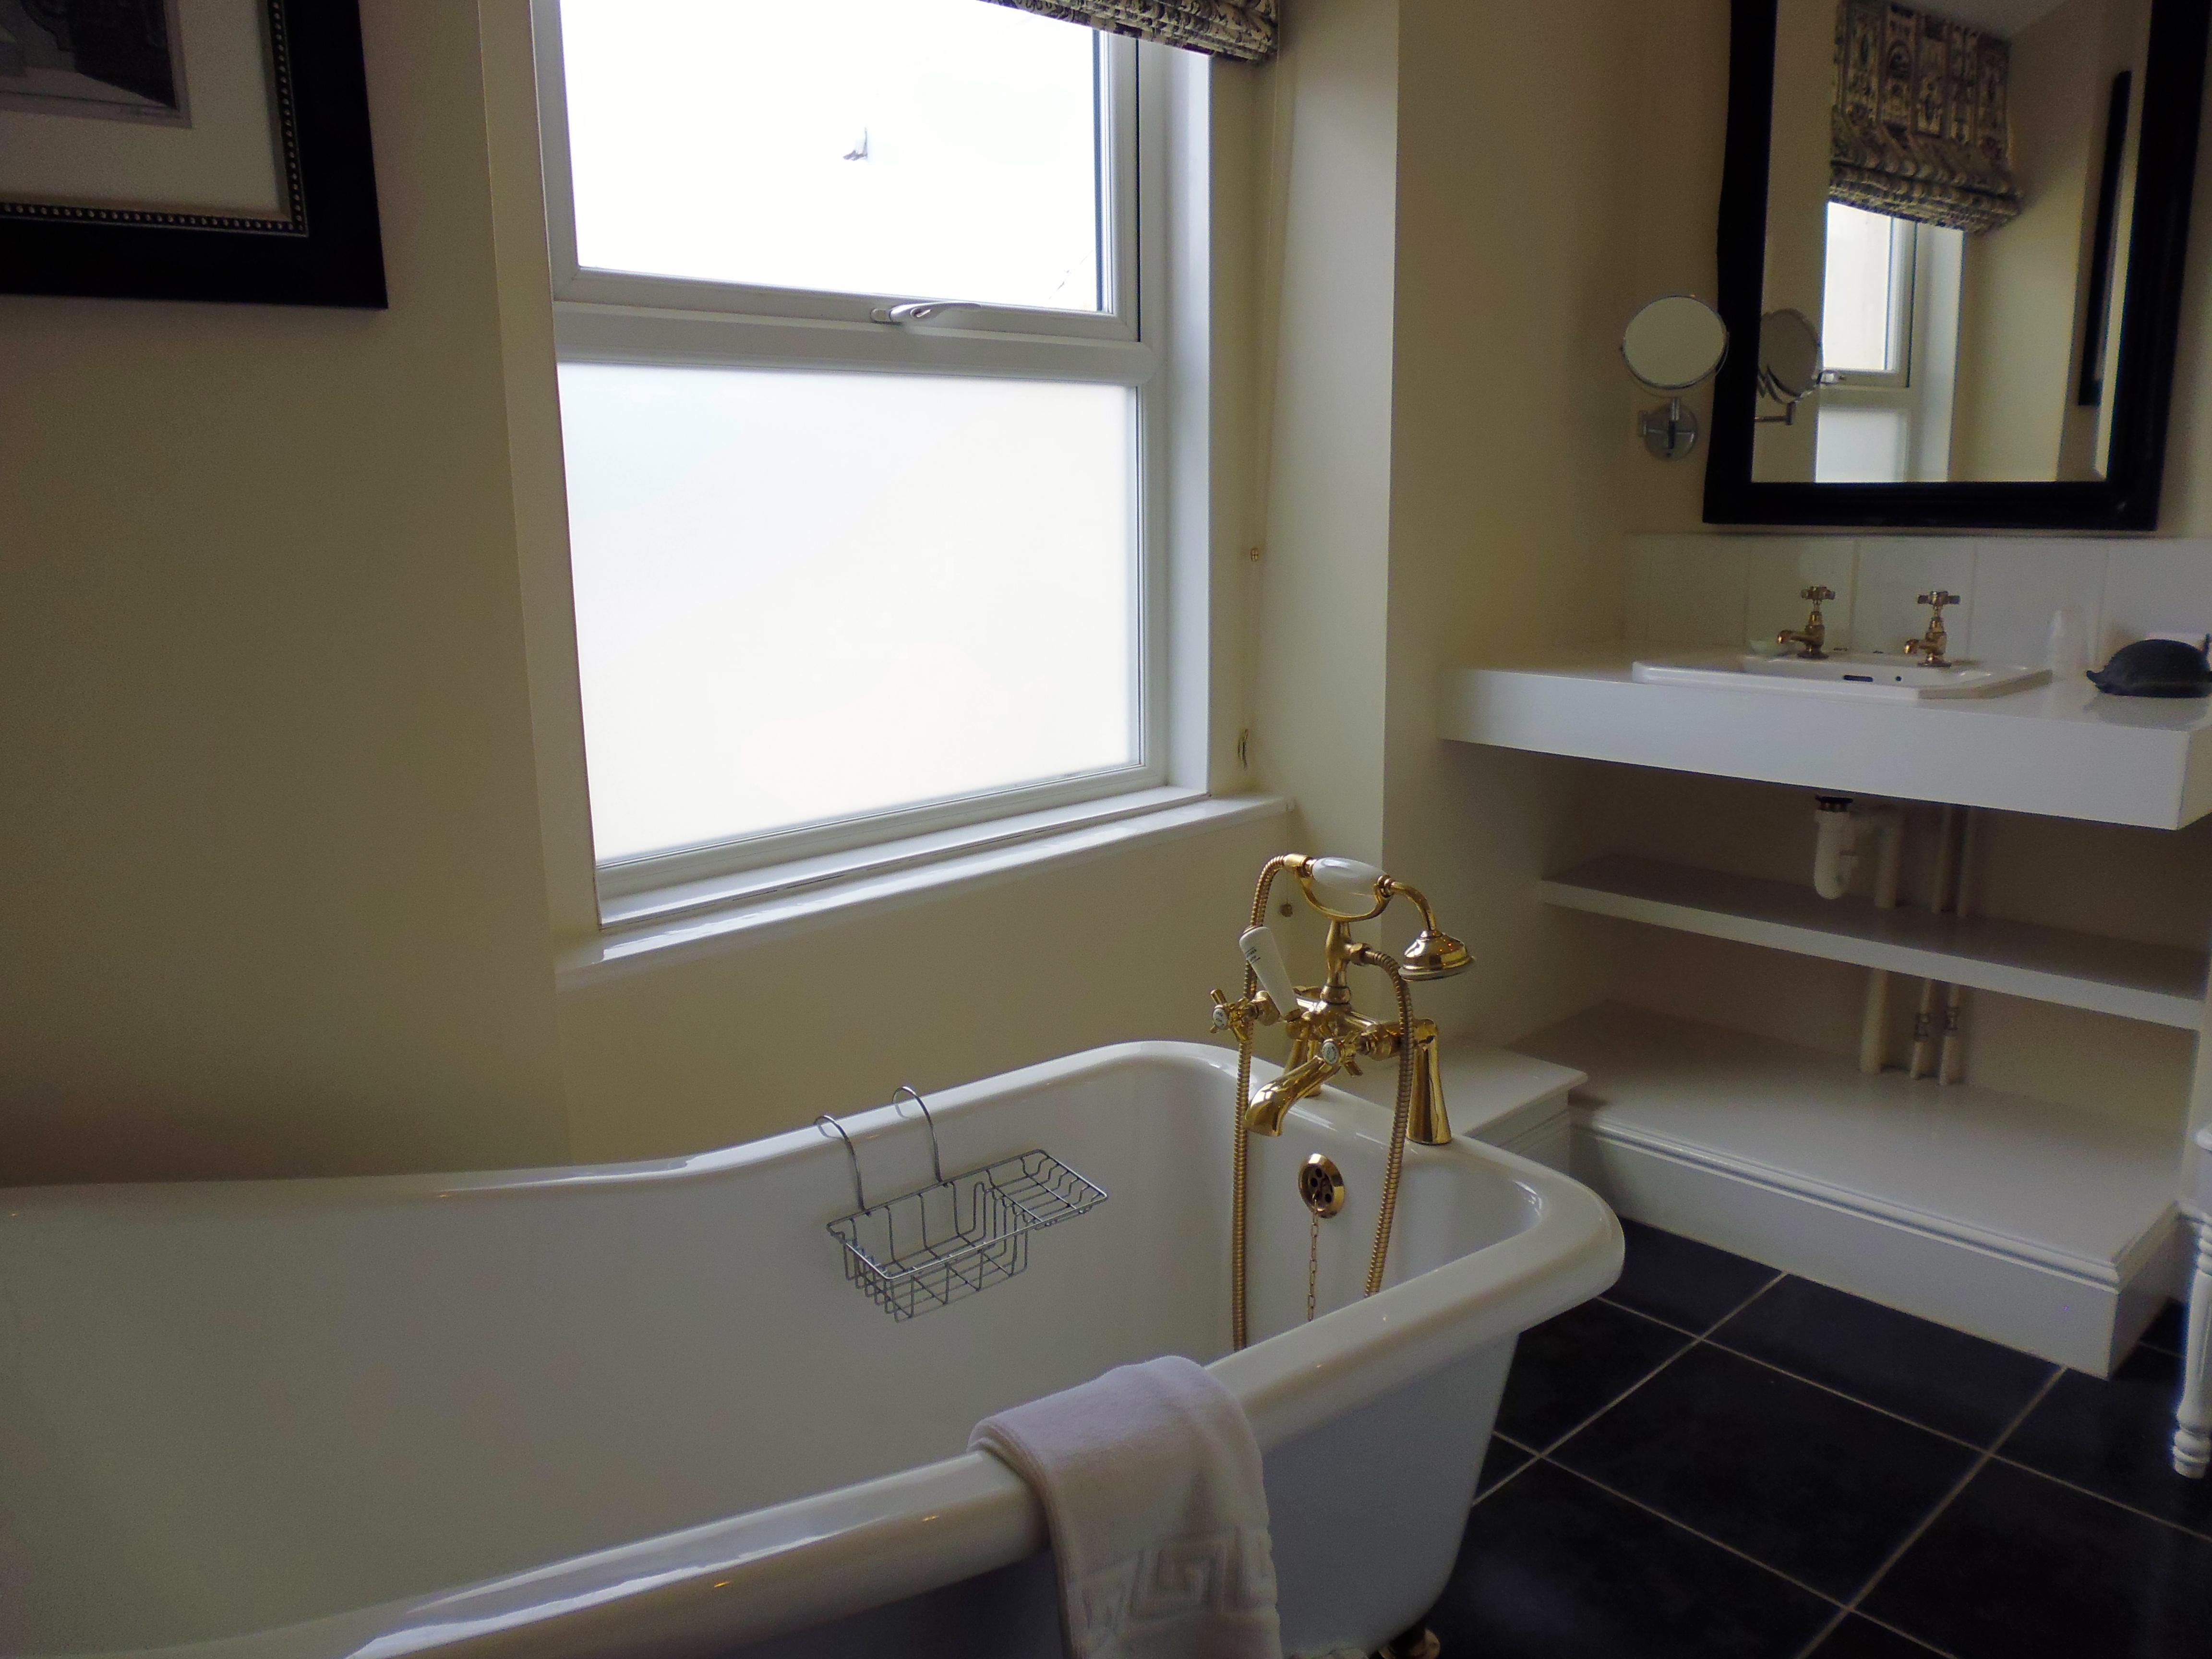 Apartment 6 bathroom